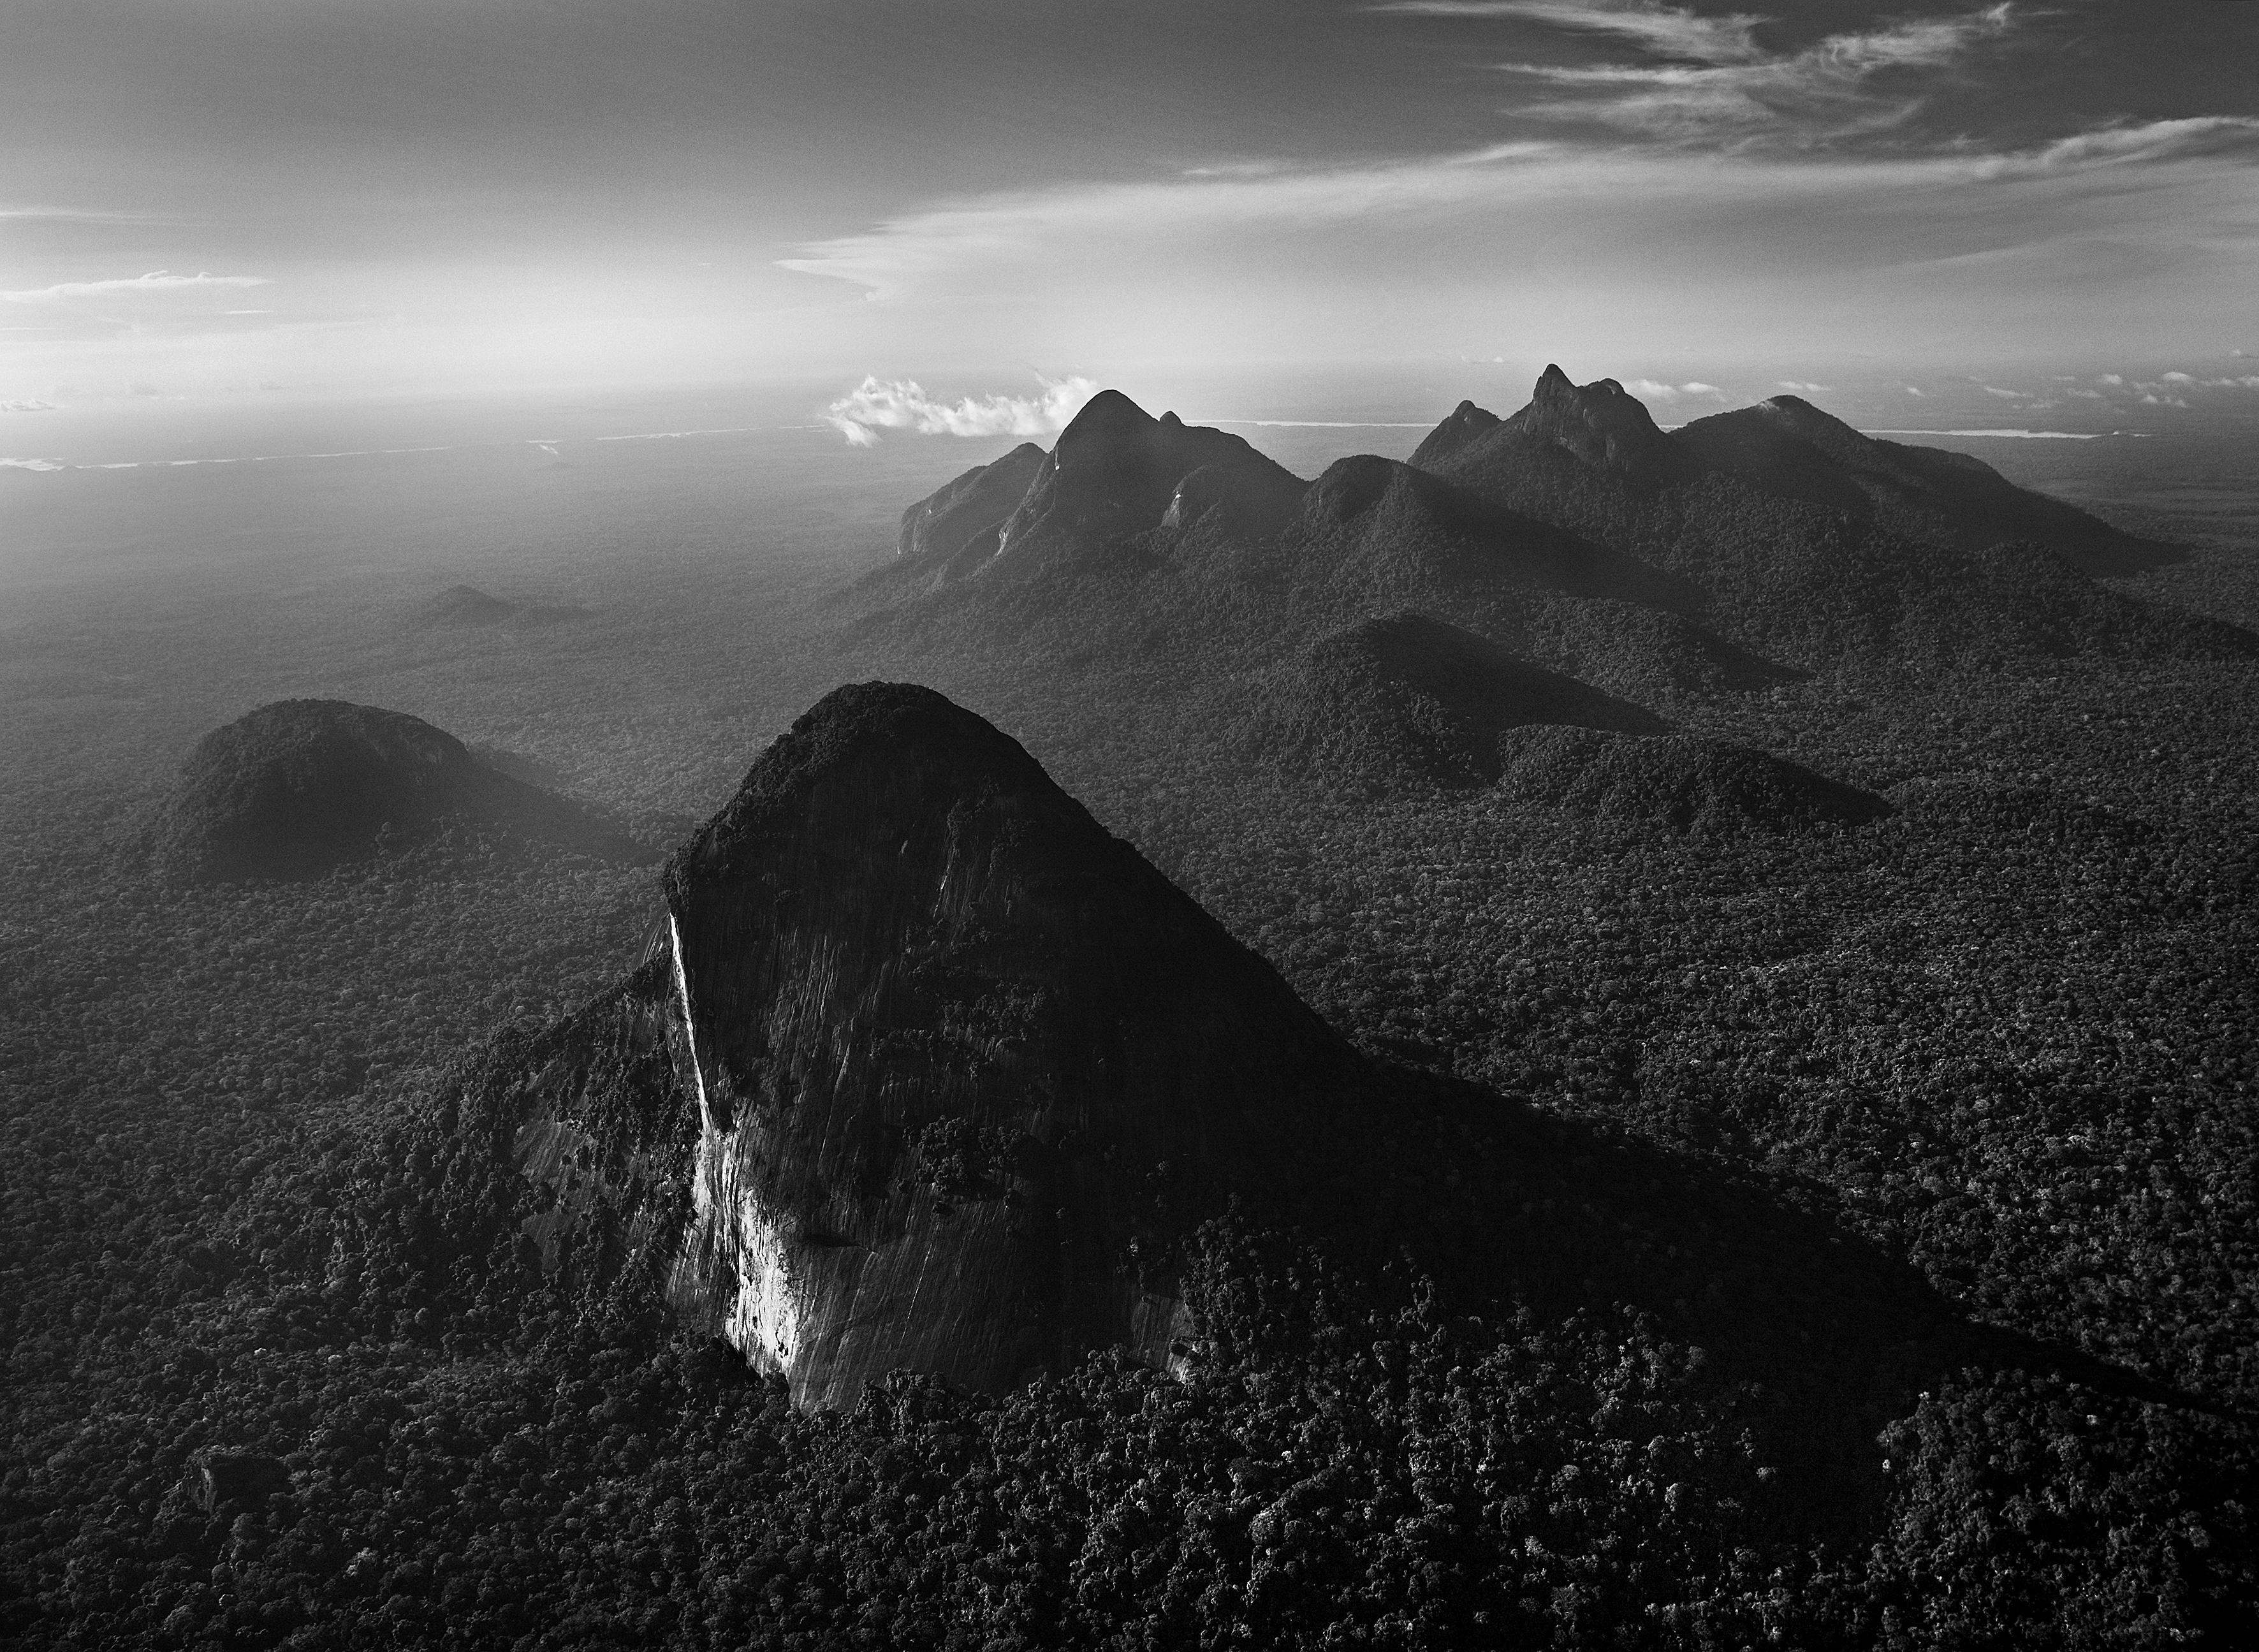 The Serra Curicuriari, with the Rio Negro in the background, Amazonas, Brazil